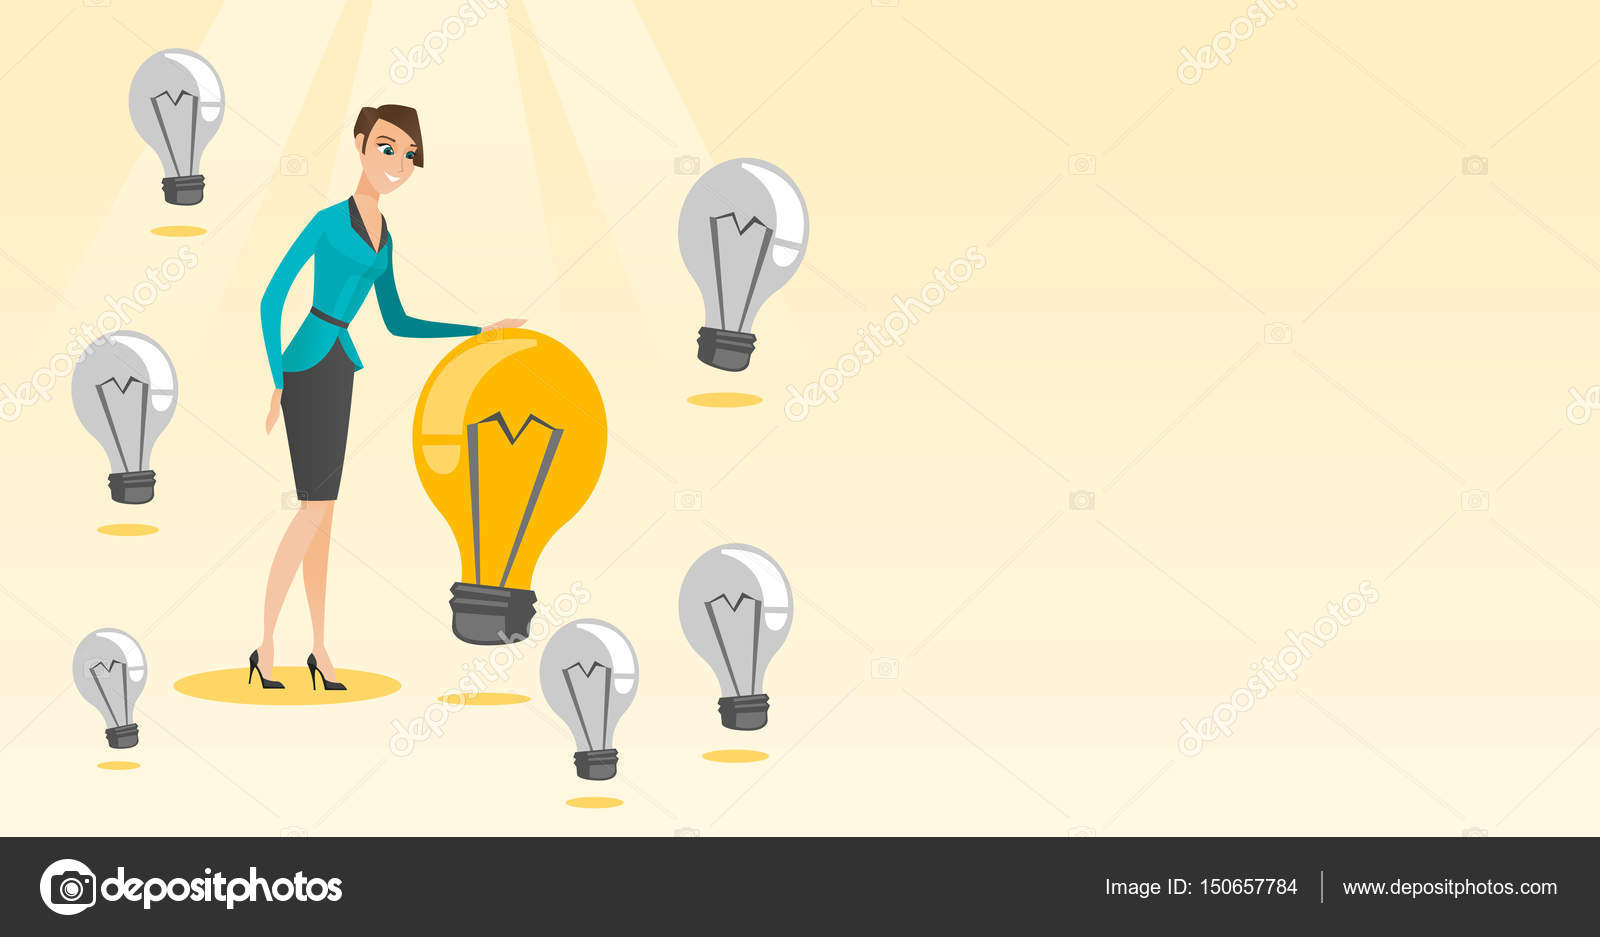 Бизнес идеи для кавказа создание бизнес плана примере